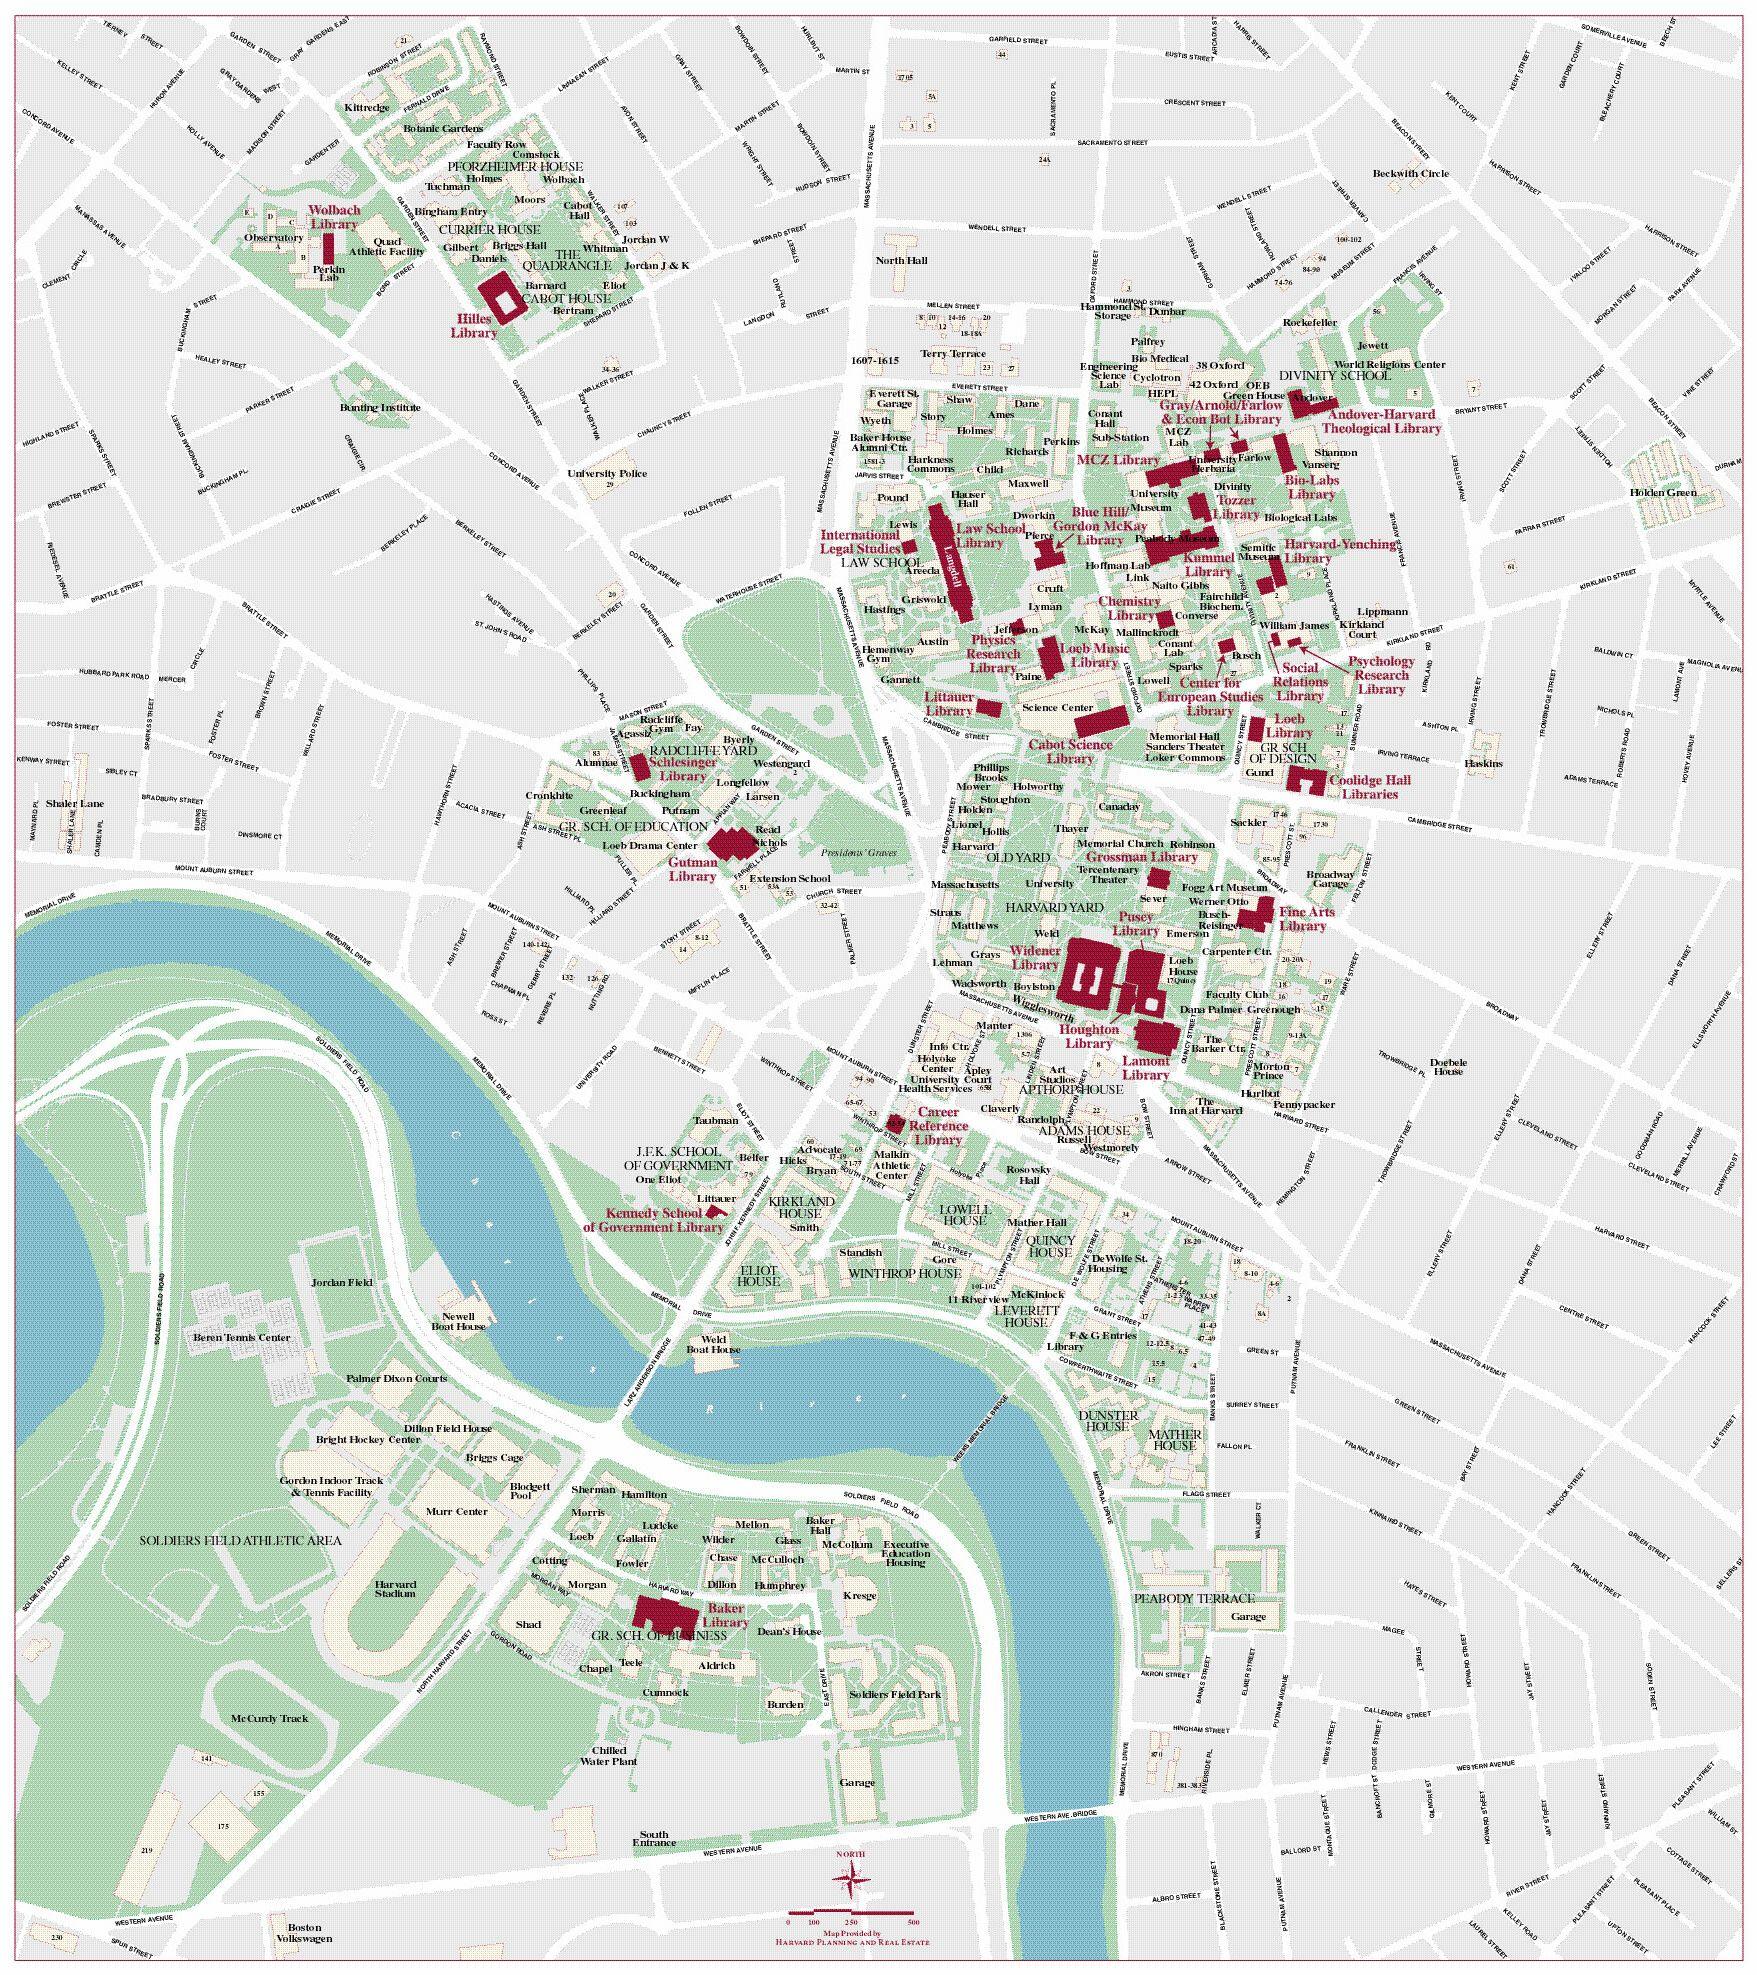 Harvard campus map | Campus map, Harvard campus, Advanced ...